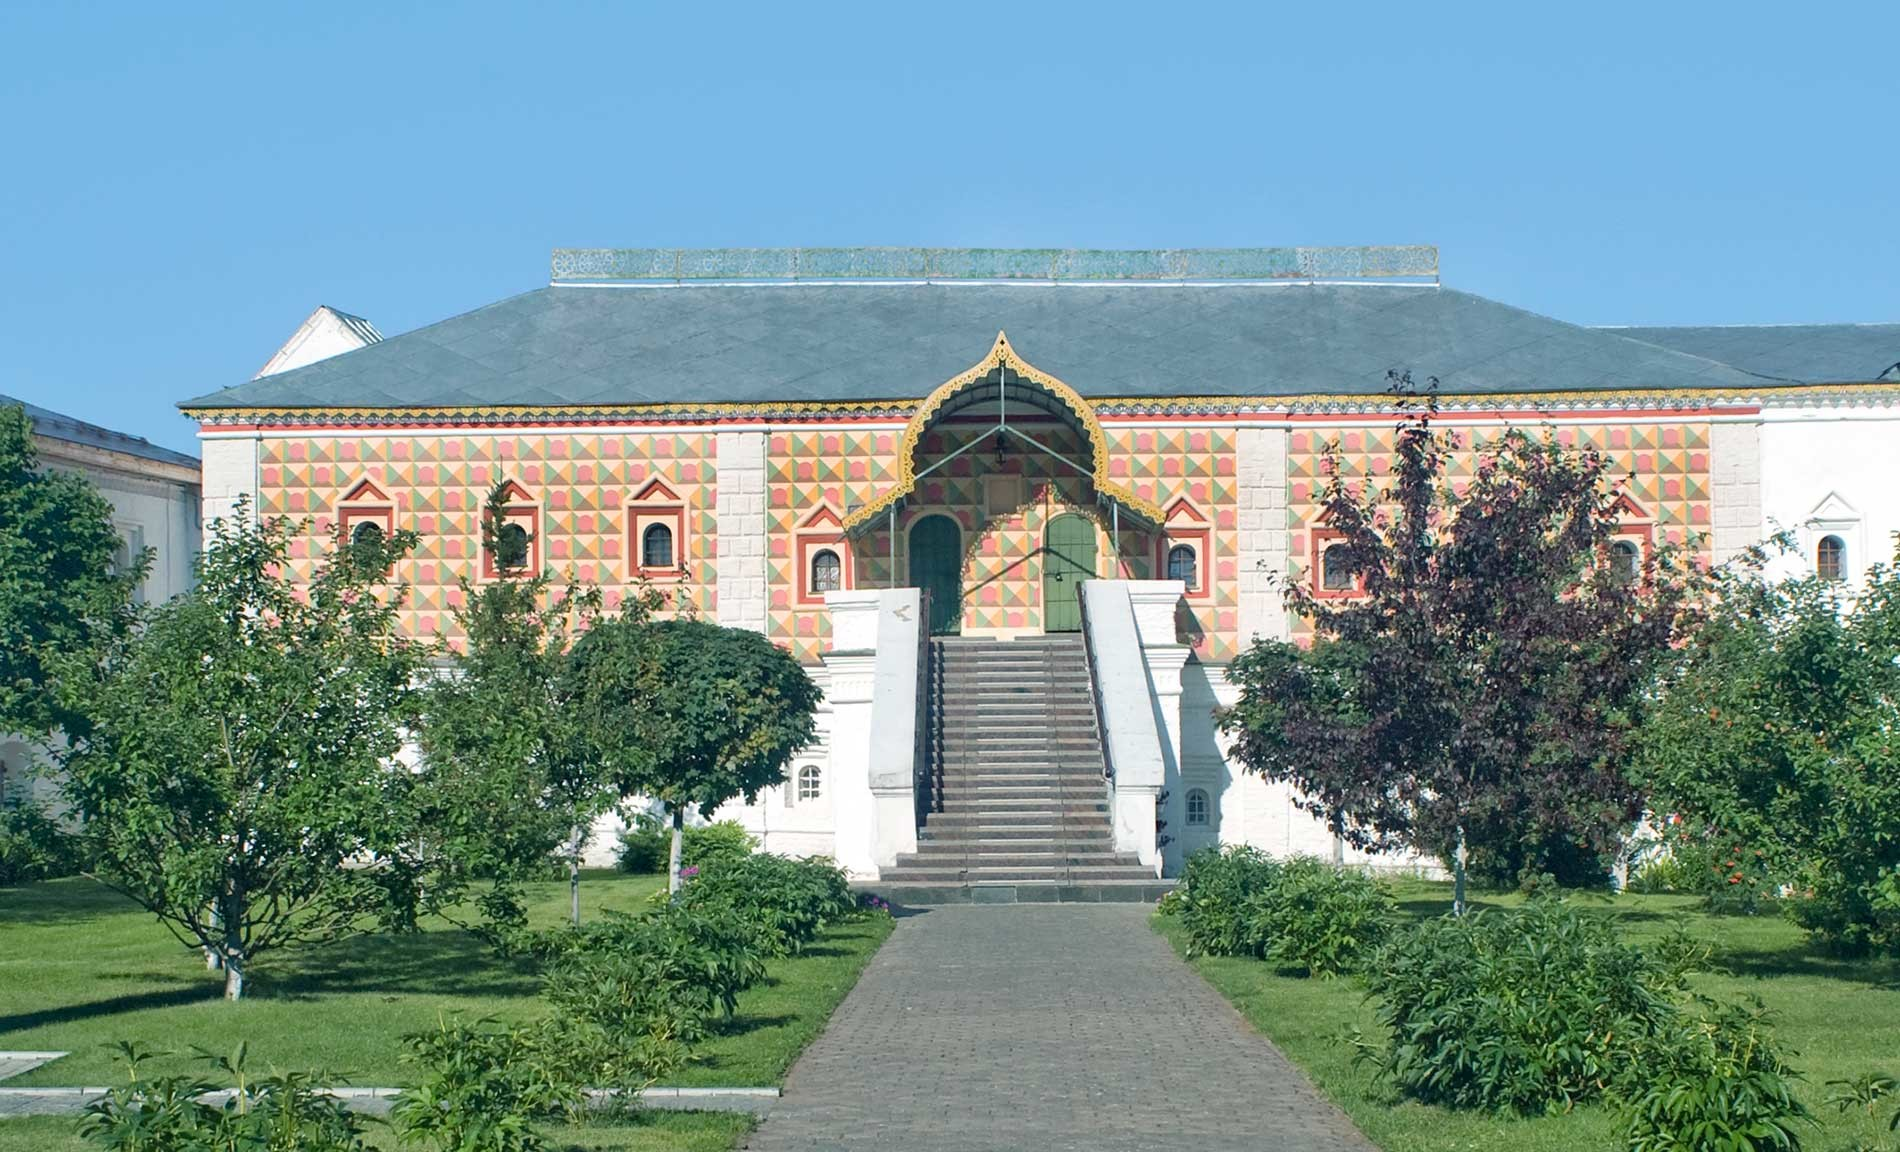 Trinity-Ipatiev Monastery. Romanov Chambers, east view. Aug. 13, 2017.